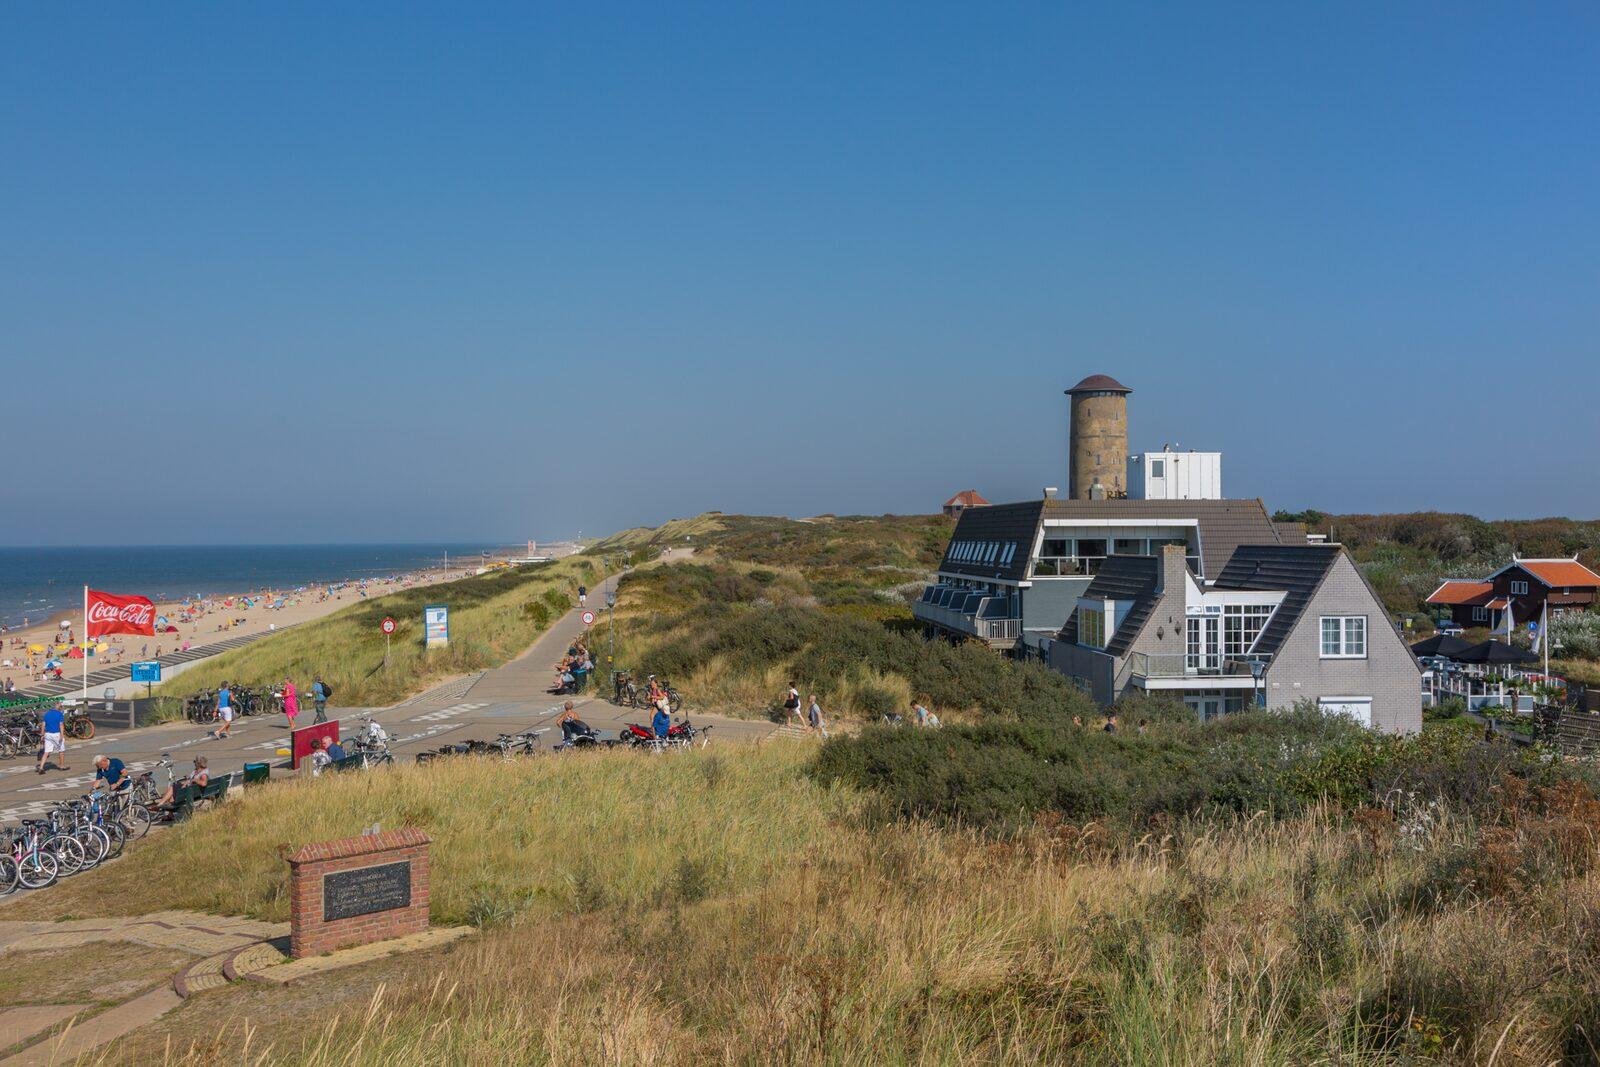 Vakantiehuis - Poldertje 3a | Domburg